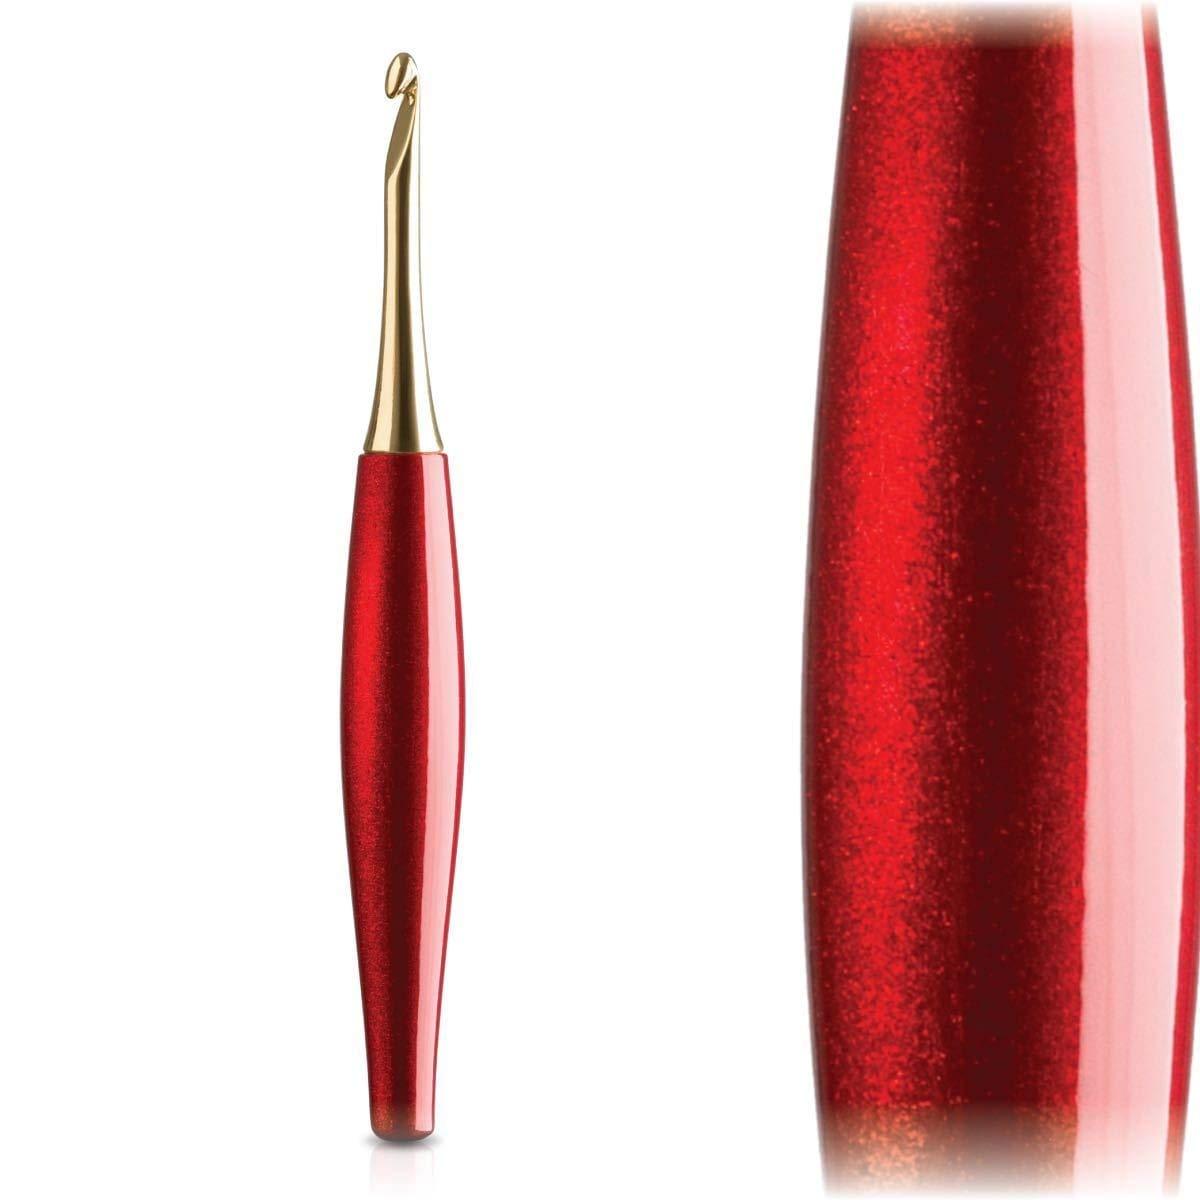 Furls Odyssey Crochet Hook 14k Gold Plated Tip, Red Ergonomic Handle G - 4.0mm